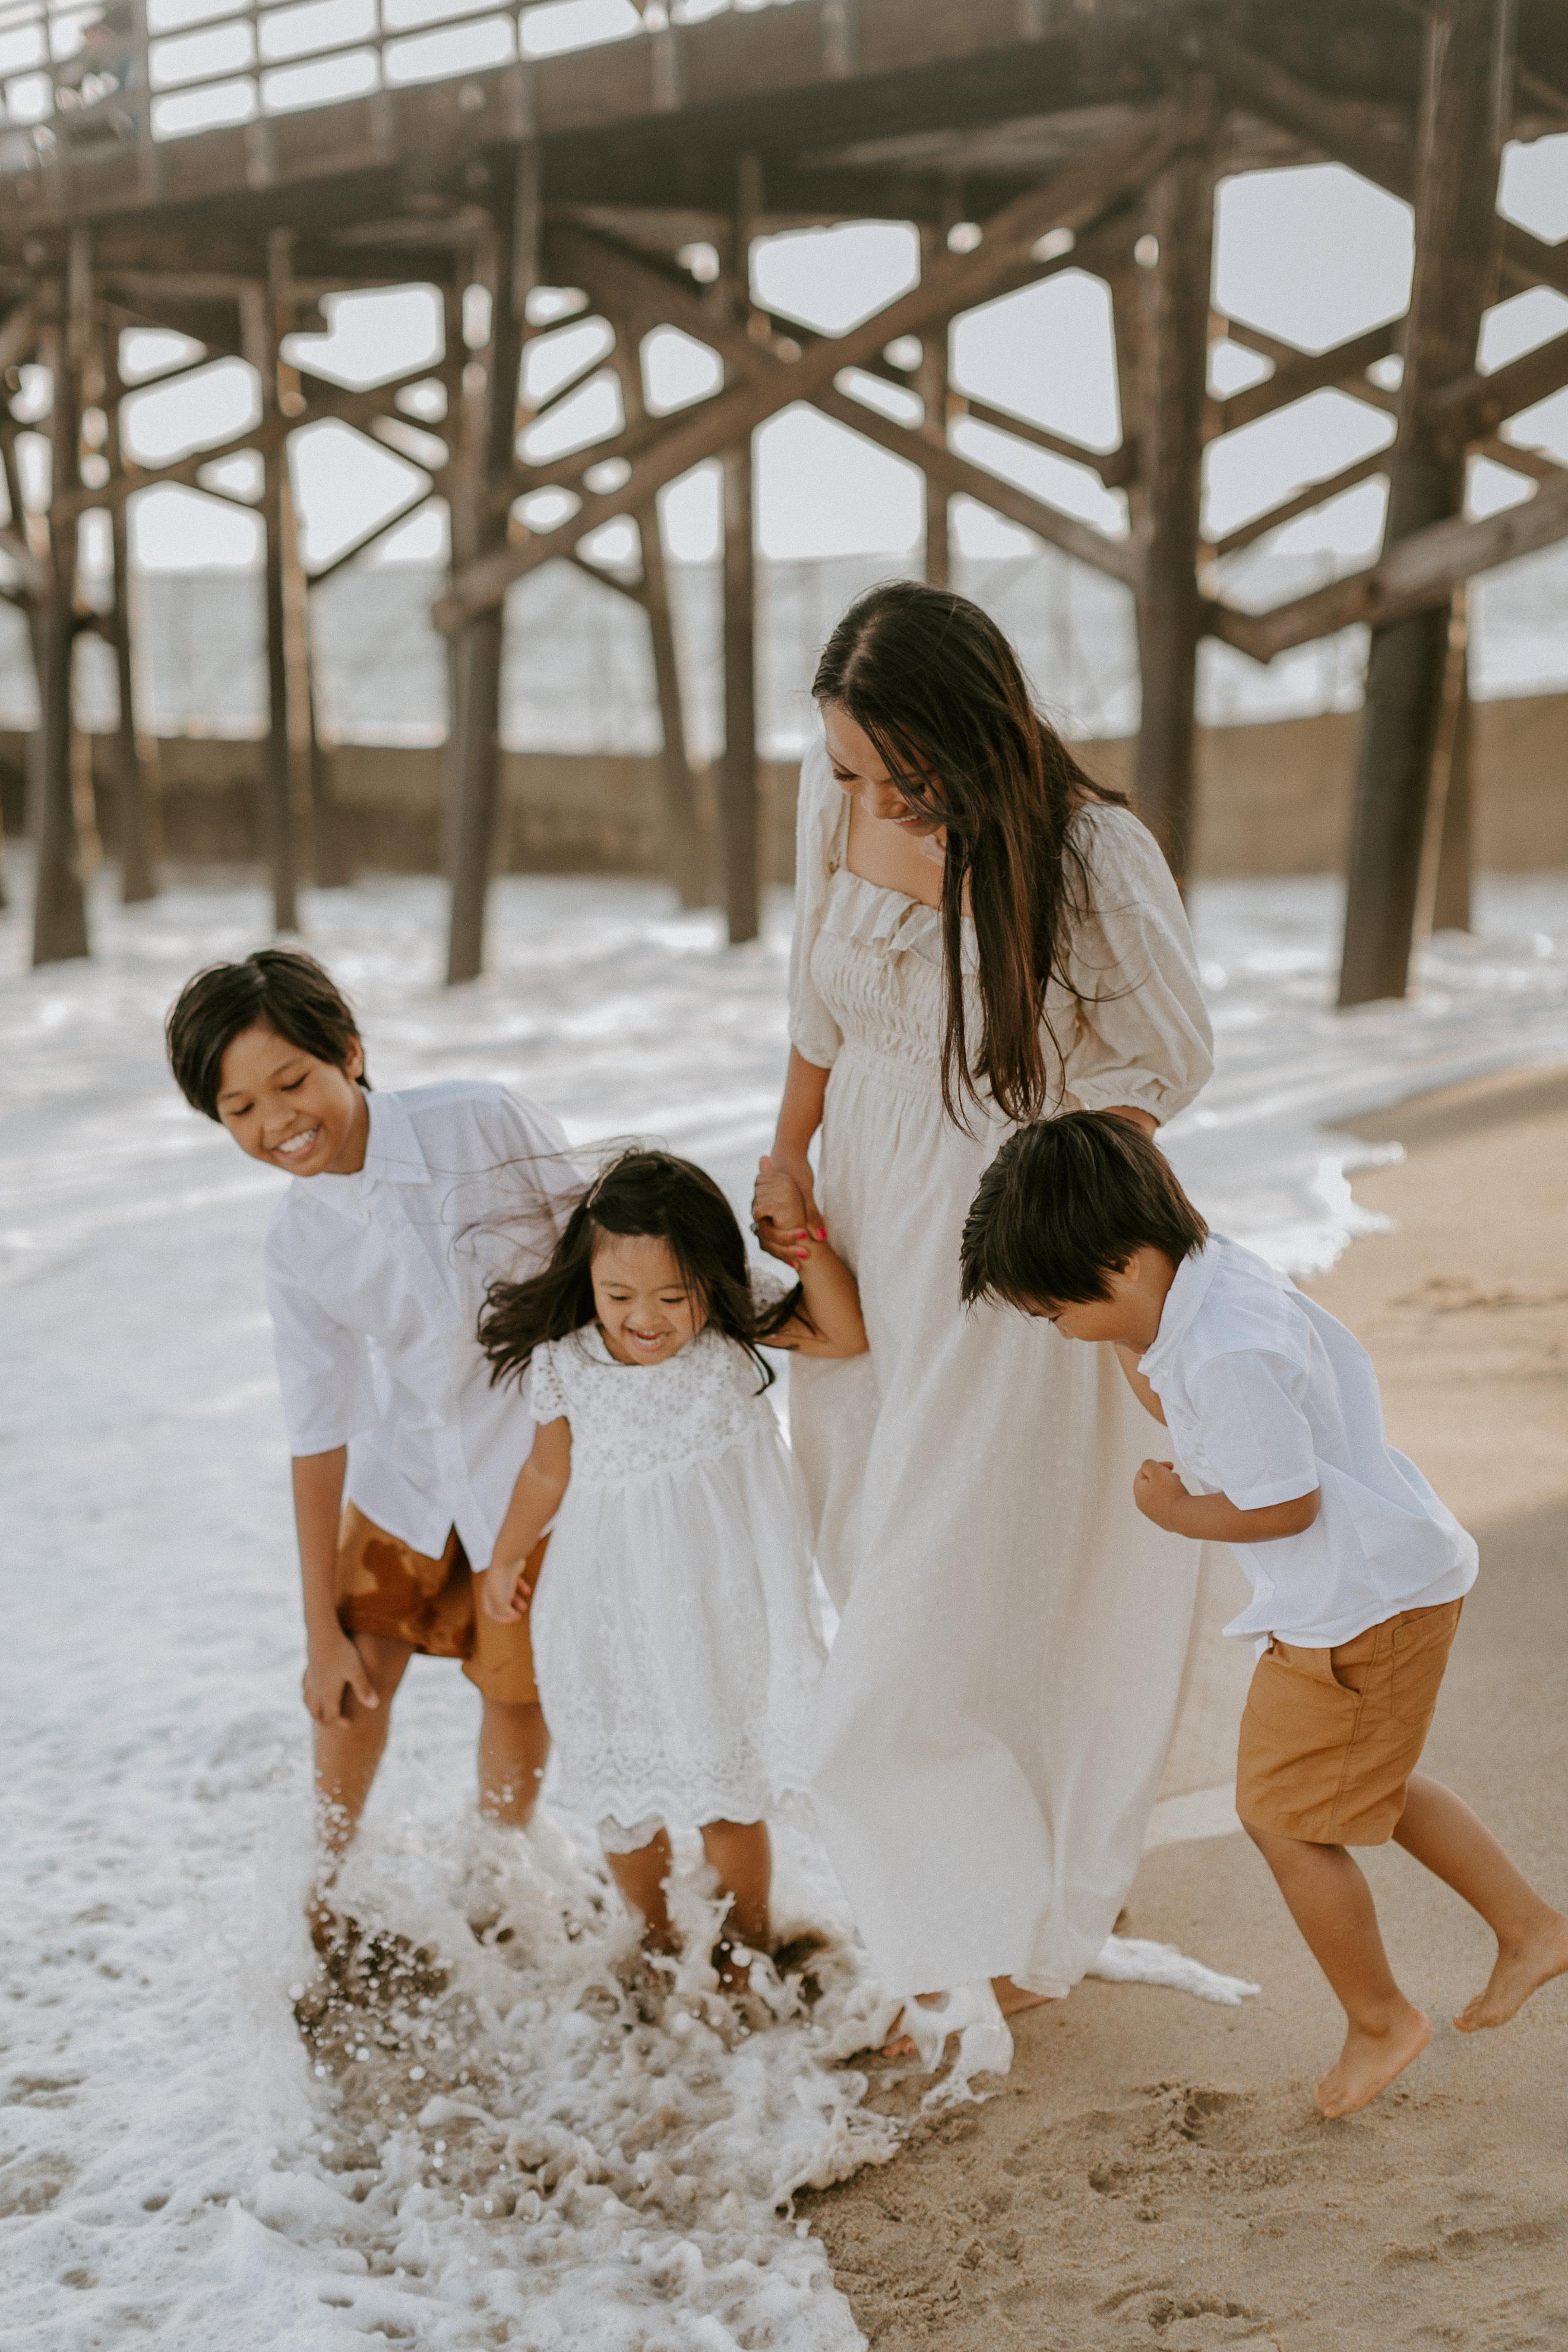 Monday 8/23 Fall Minis 2021: Seal Beach